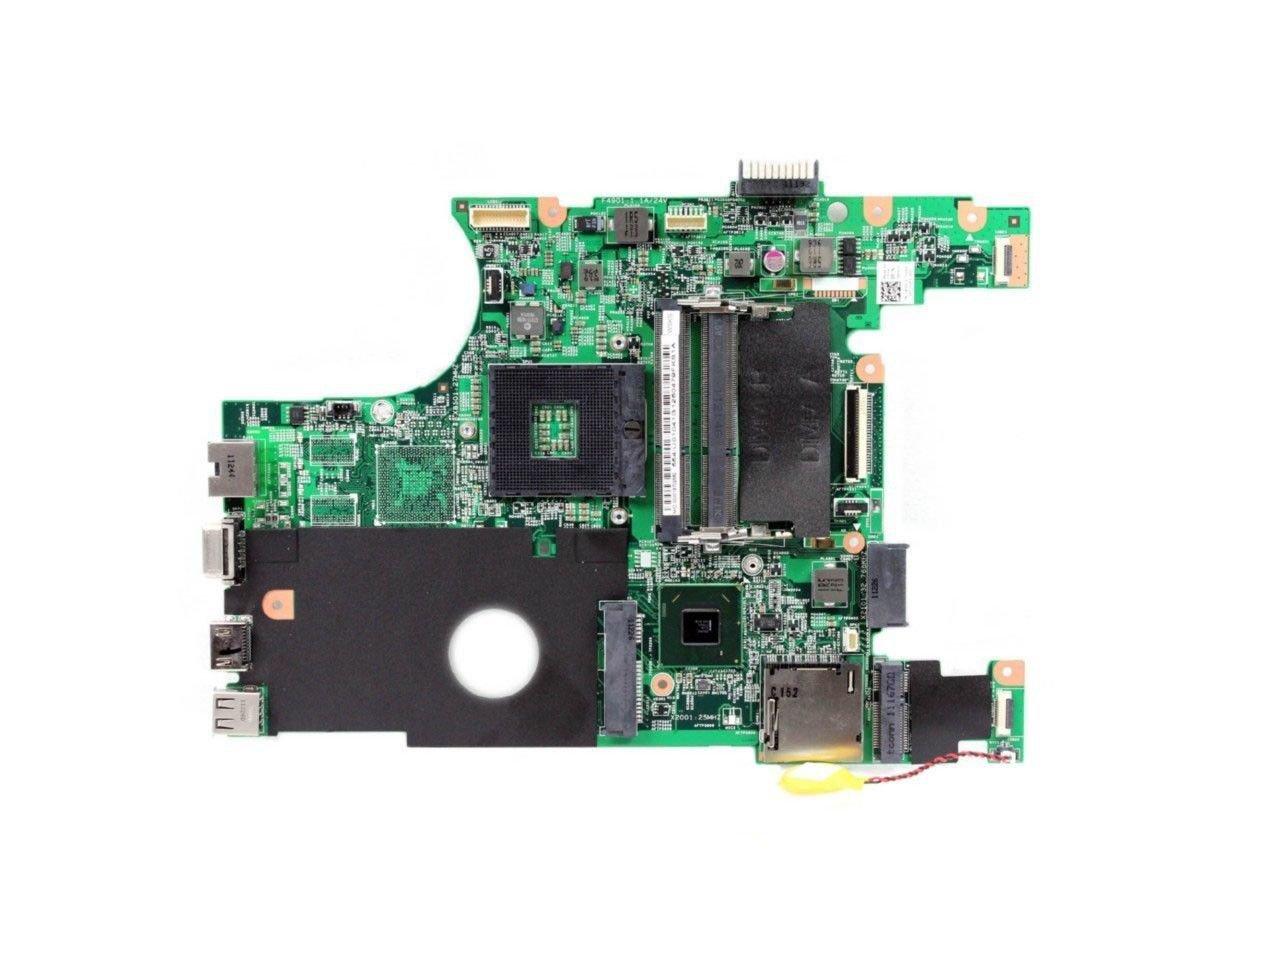 Dell Inspiron 14R N4050 Motherboard 0X0DC1 CN-0X0DC1 CN0X0DC1 X0DC1